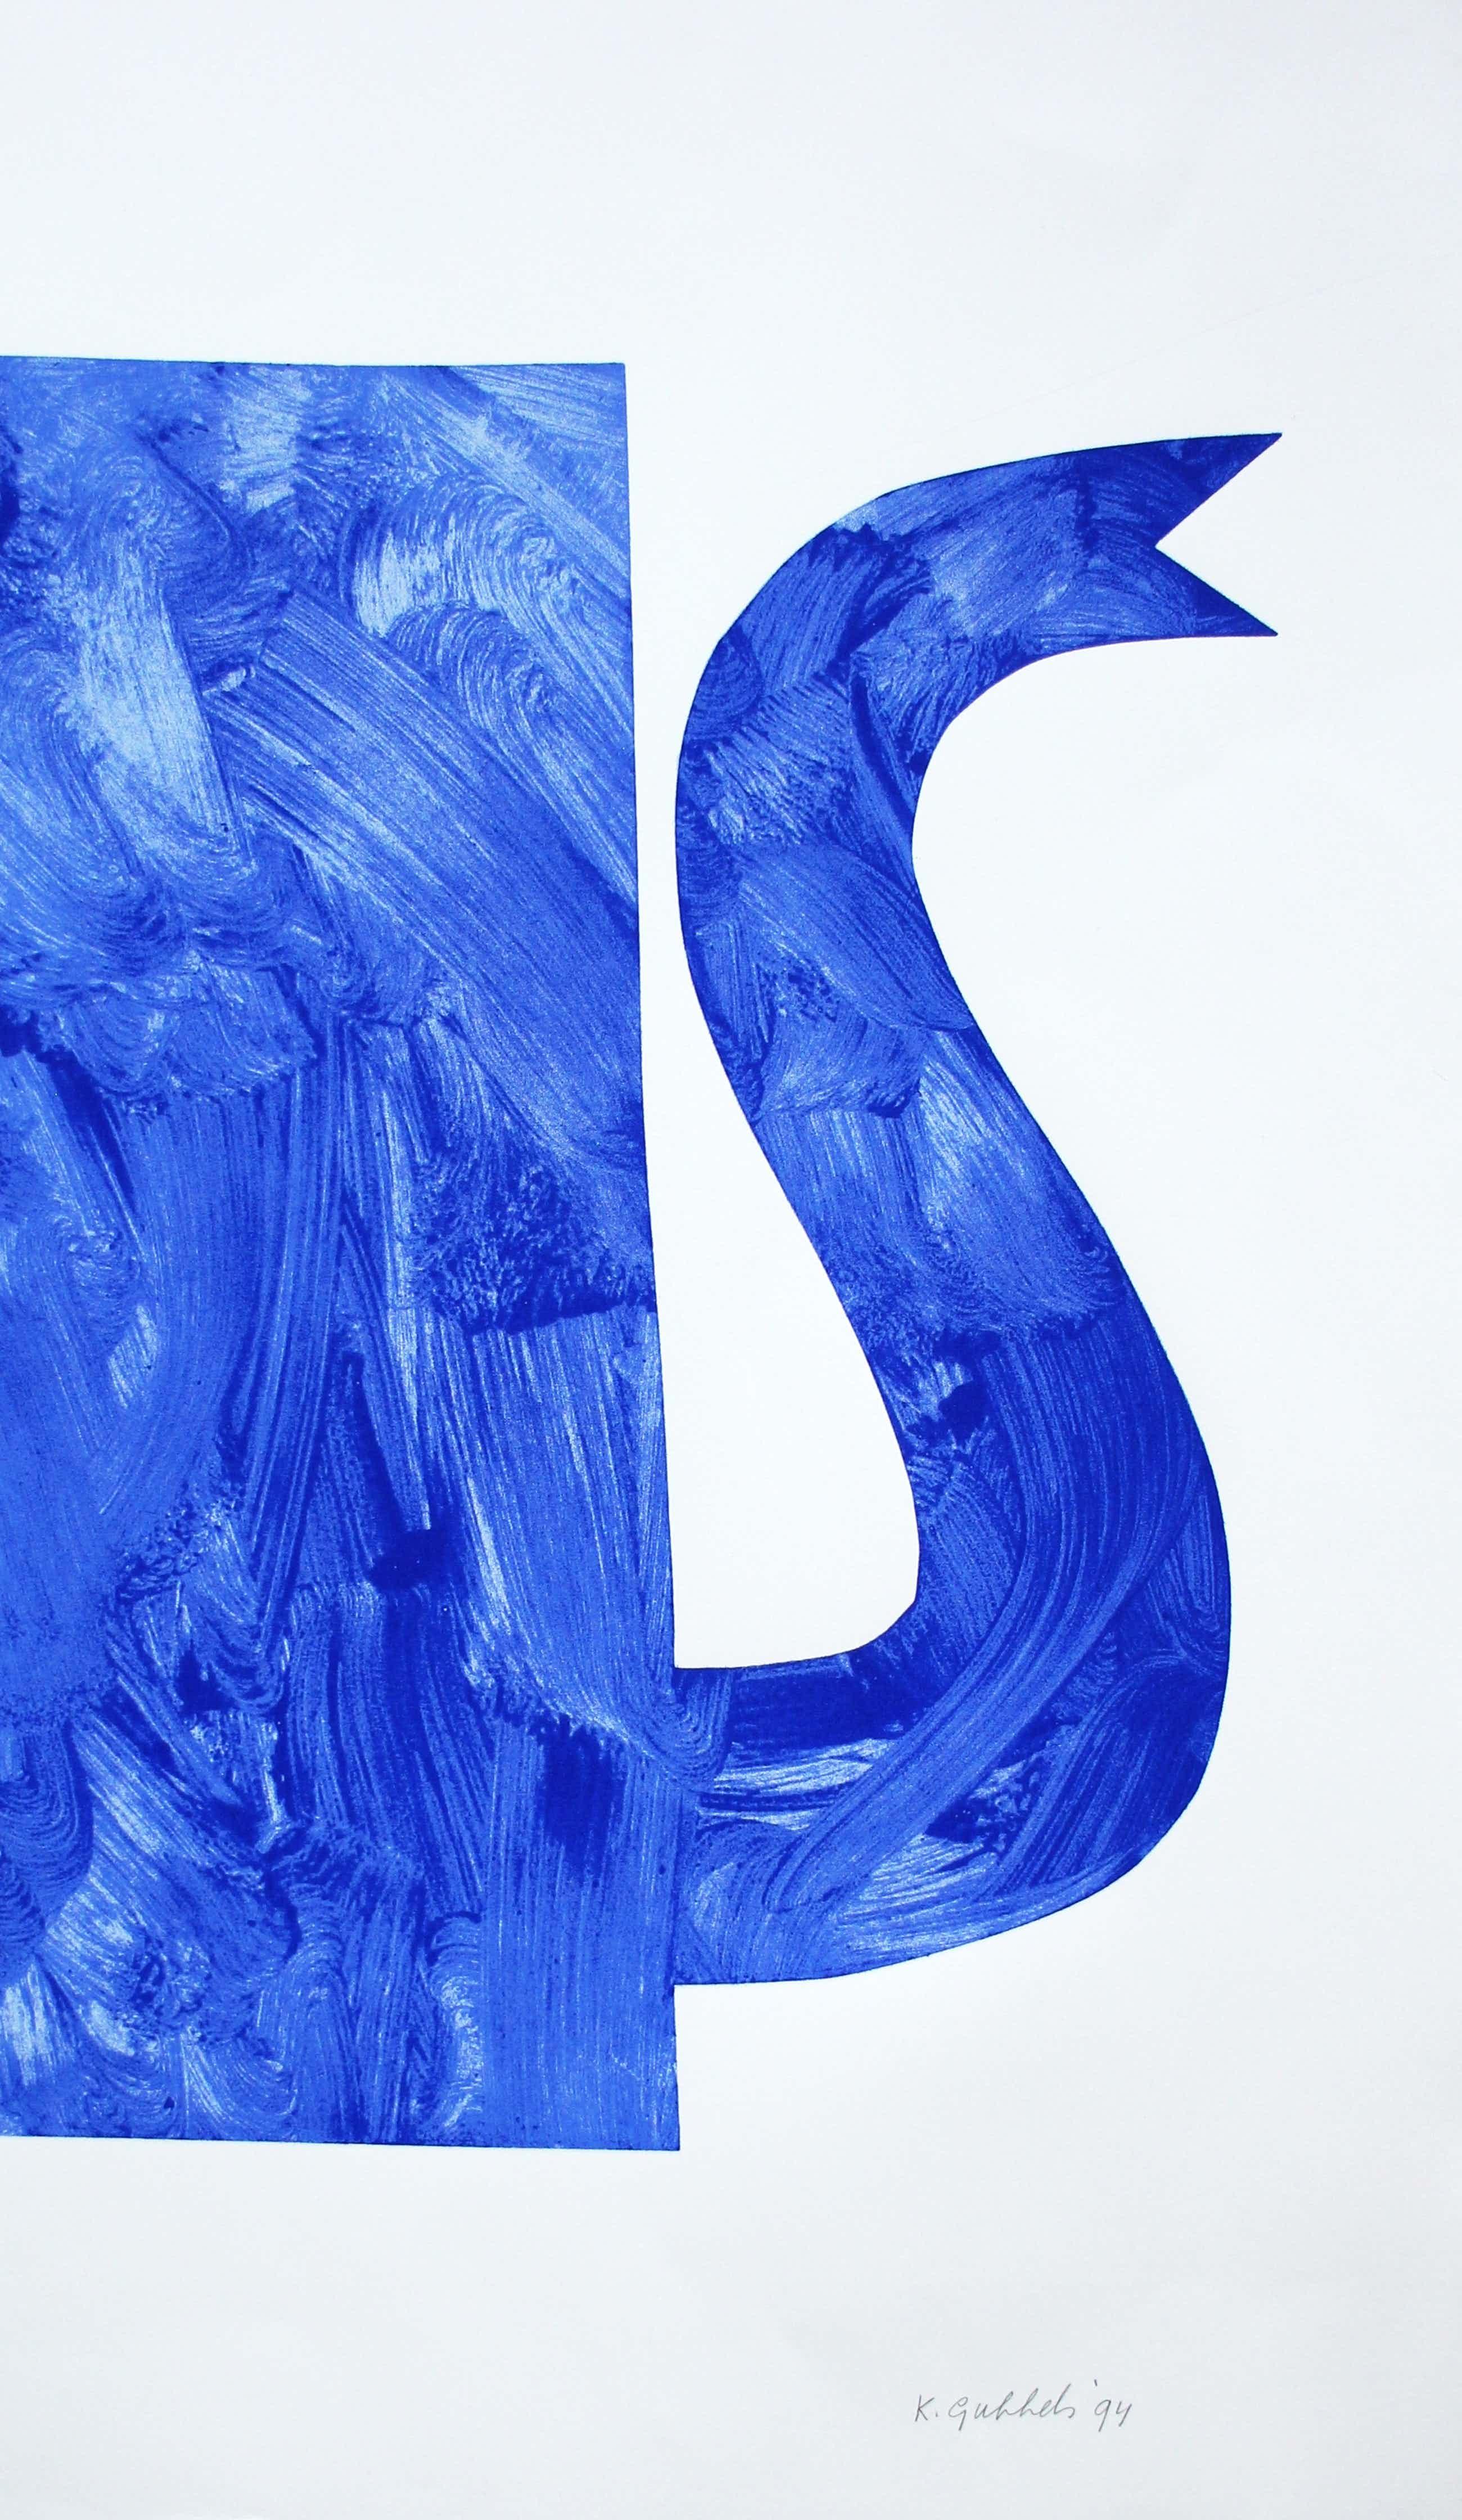 Klaas Gubbels - grote zeefdruk: blauwe kan - 1994 kopen? Bied vanaf 375!